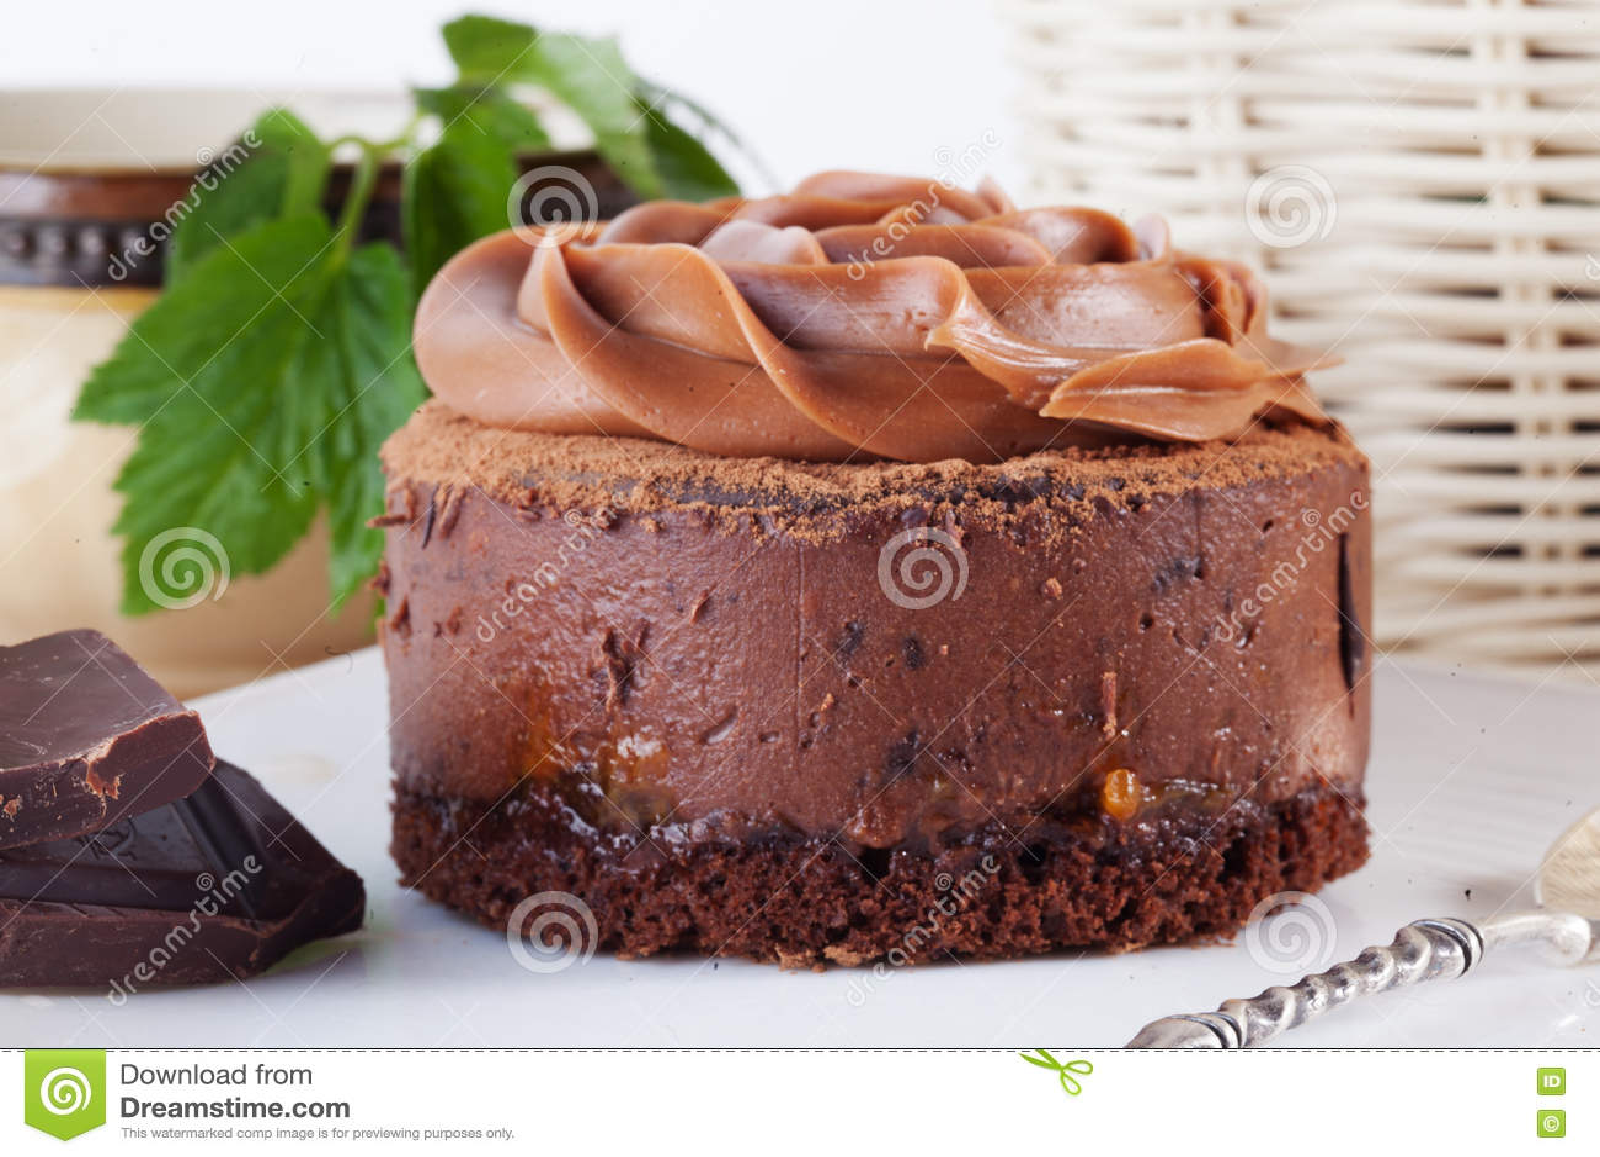 Rose Chocolate Mousse Cake On A Beautiful Plate Cream Stock Photo